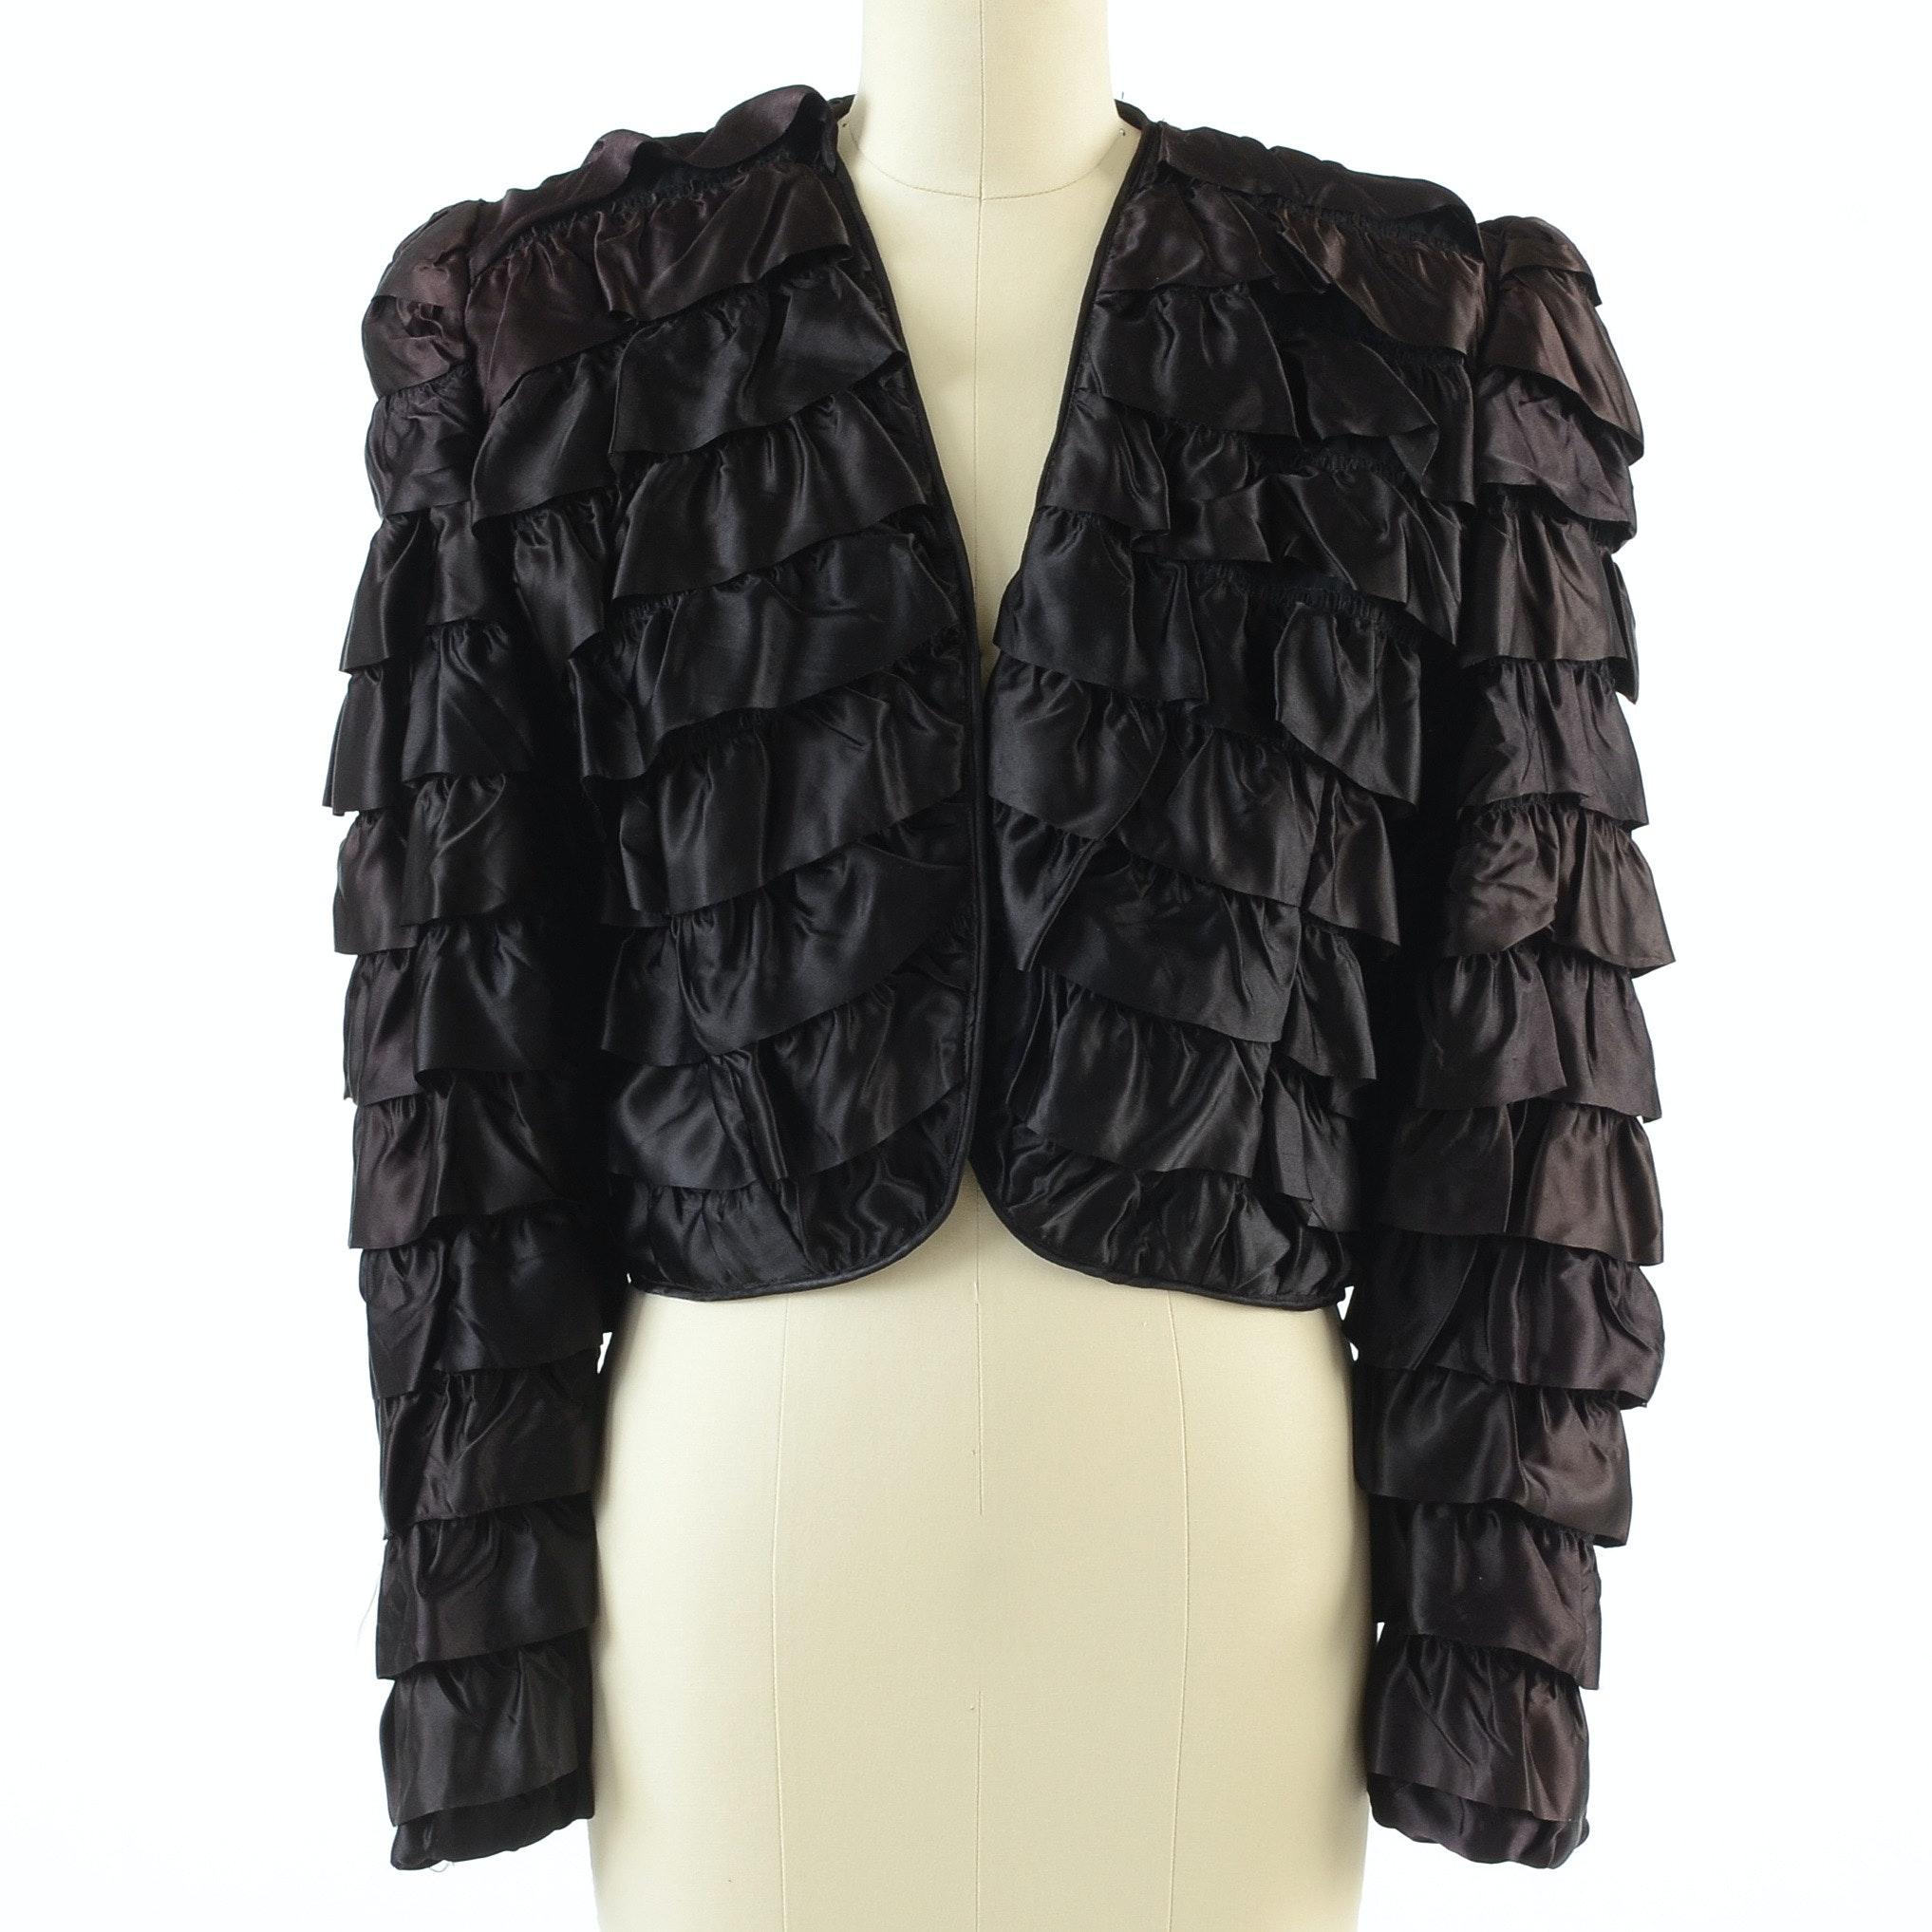 Vintage C. M. Lafra of New York Couture Black Silk Ruffled Crop Jacket